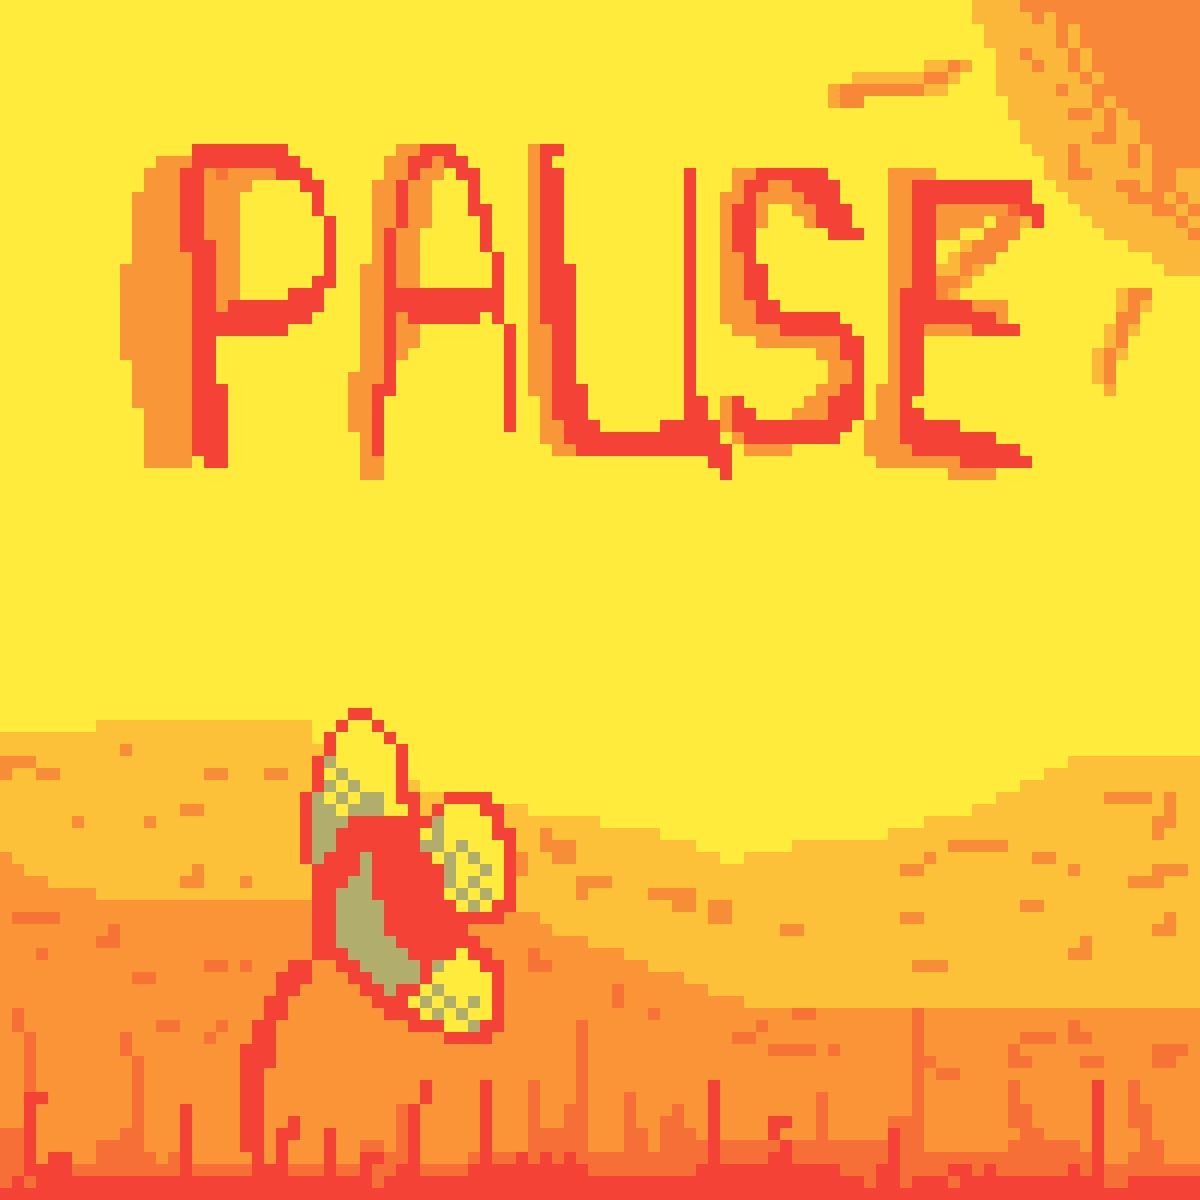 Pause by DownhillsDowner